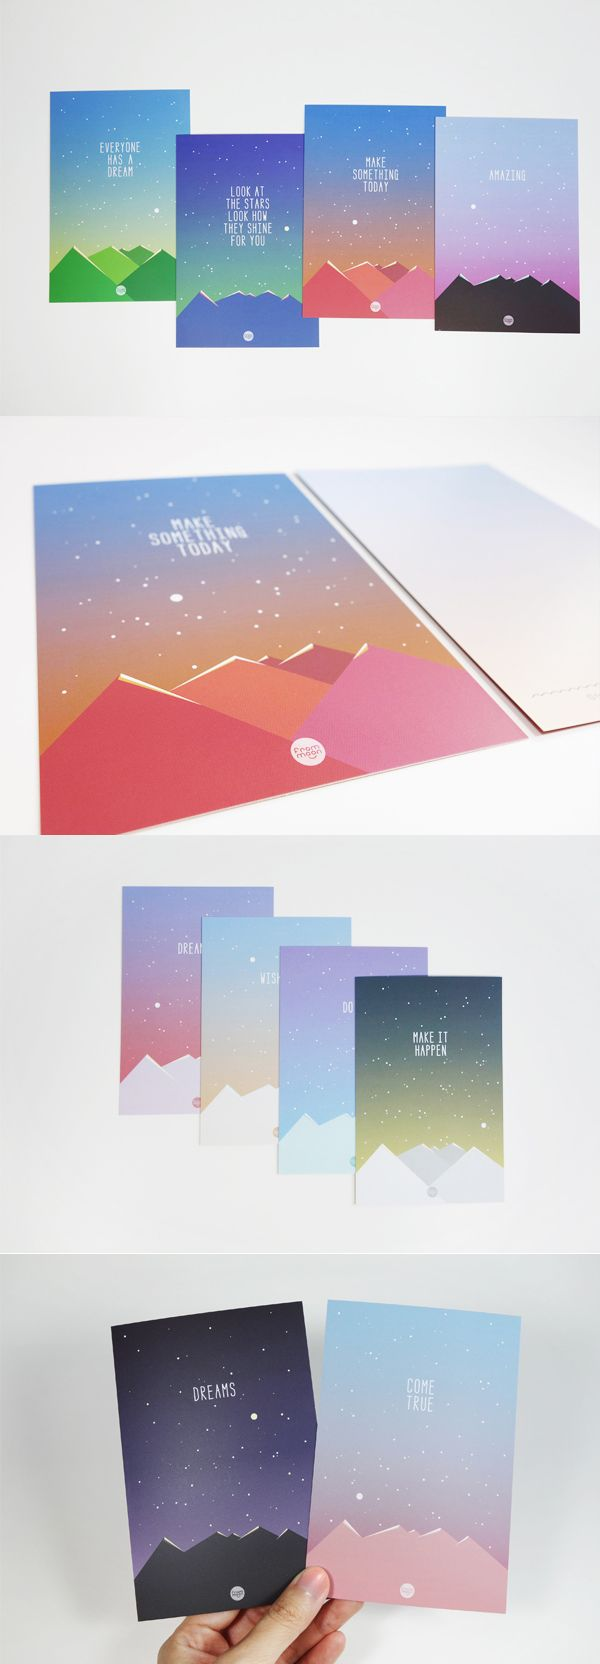 Postcard Design Ideas business postcard ideas 05 genevieve bjargardottir identity Starlight Postcard